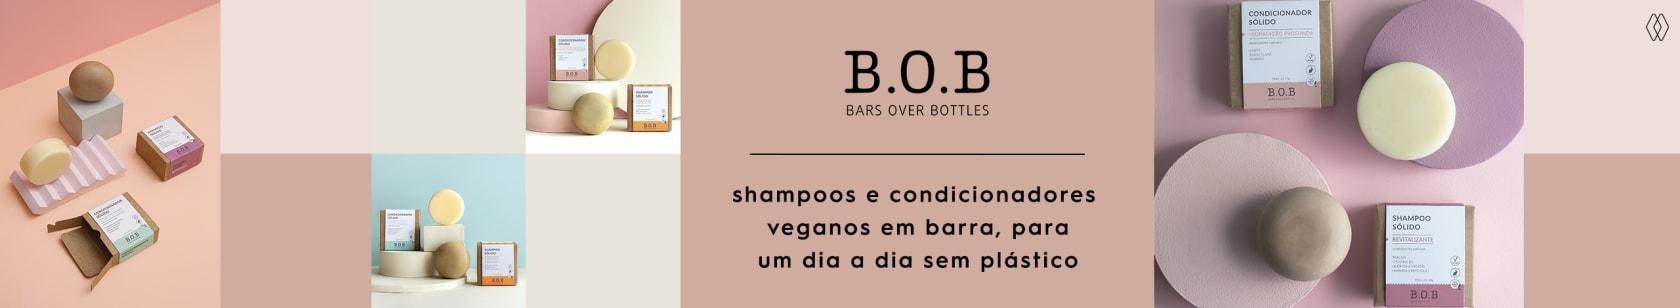 B.O.B Bars Over Bottles | AMARO